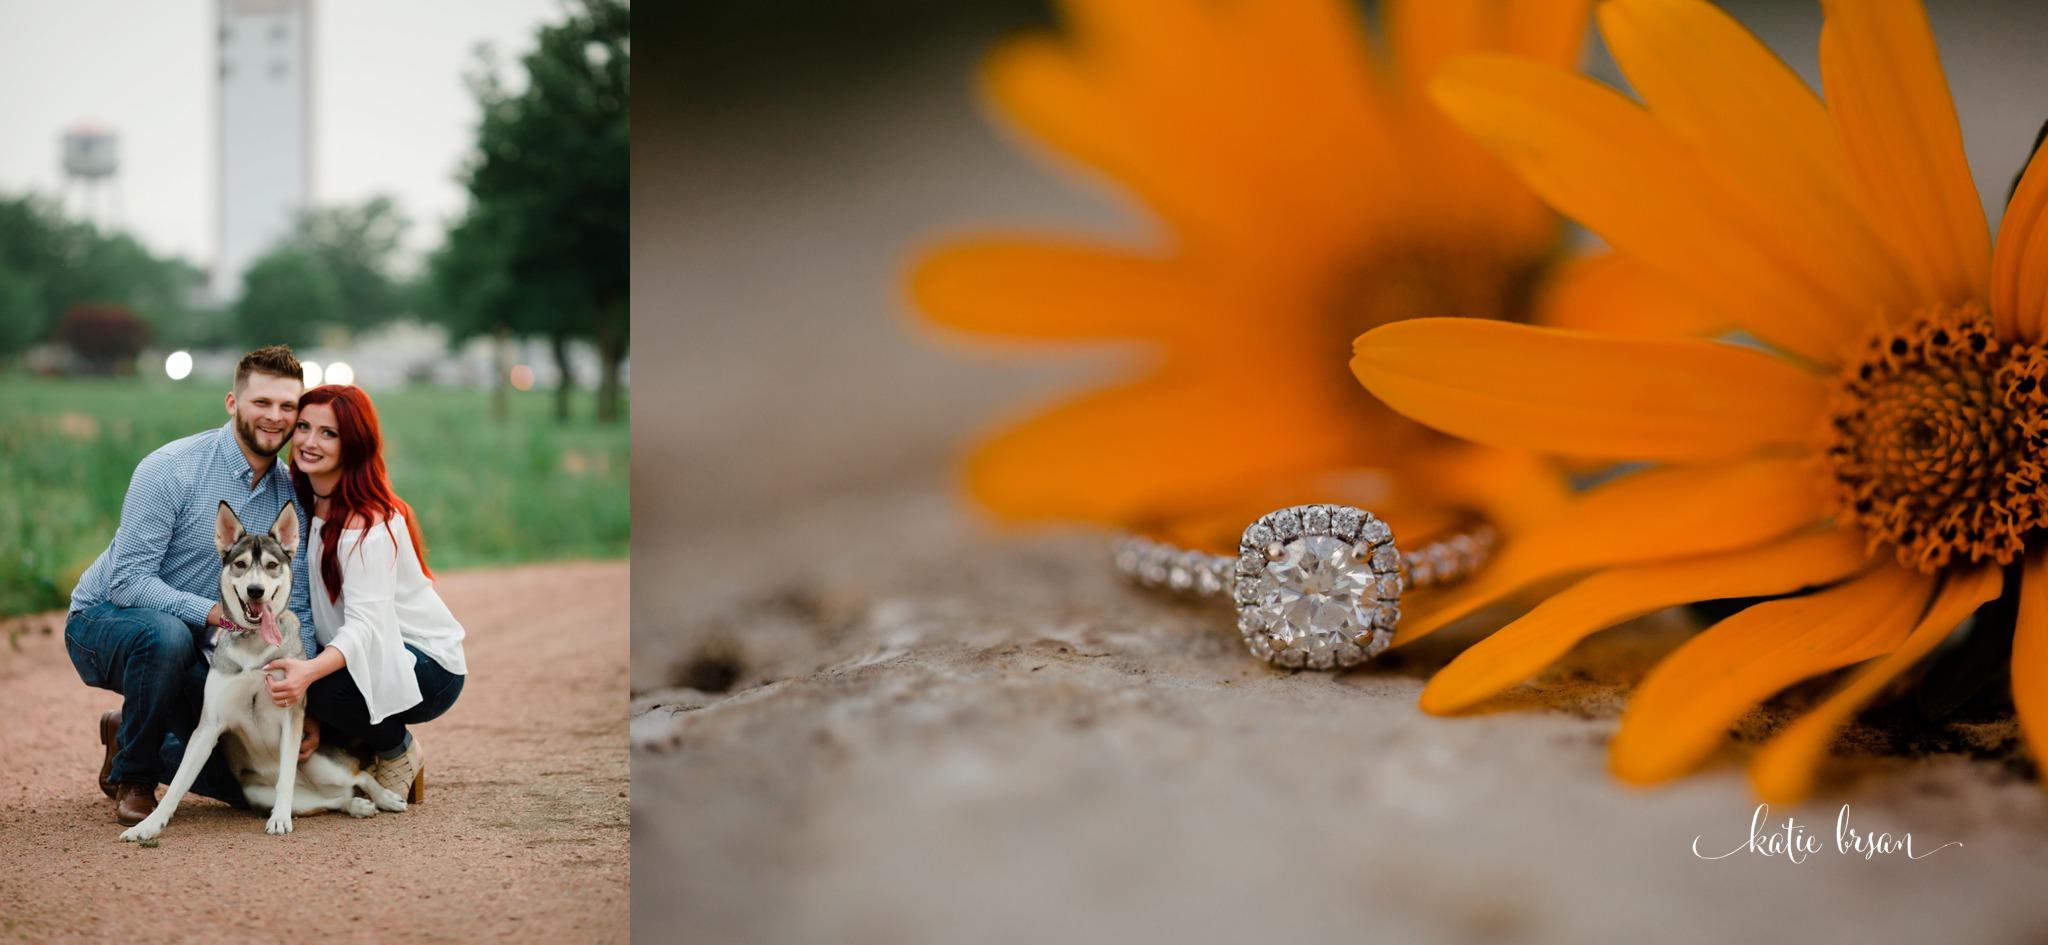 Frankfort-engagementsession-plainfieldwedding_0205.jpg